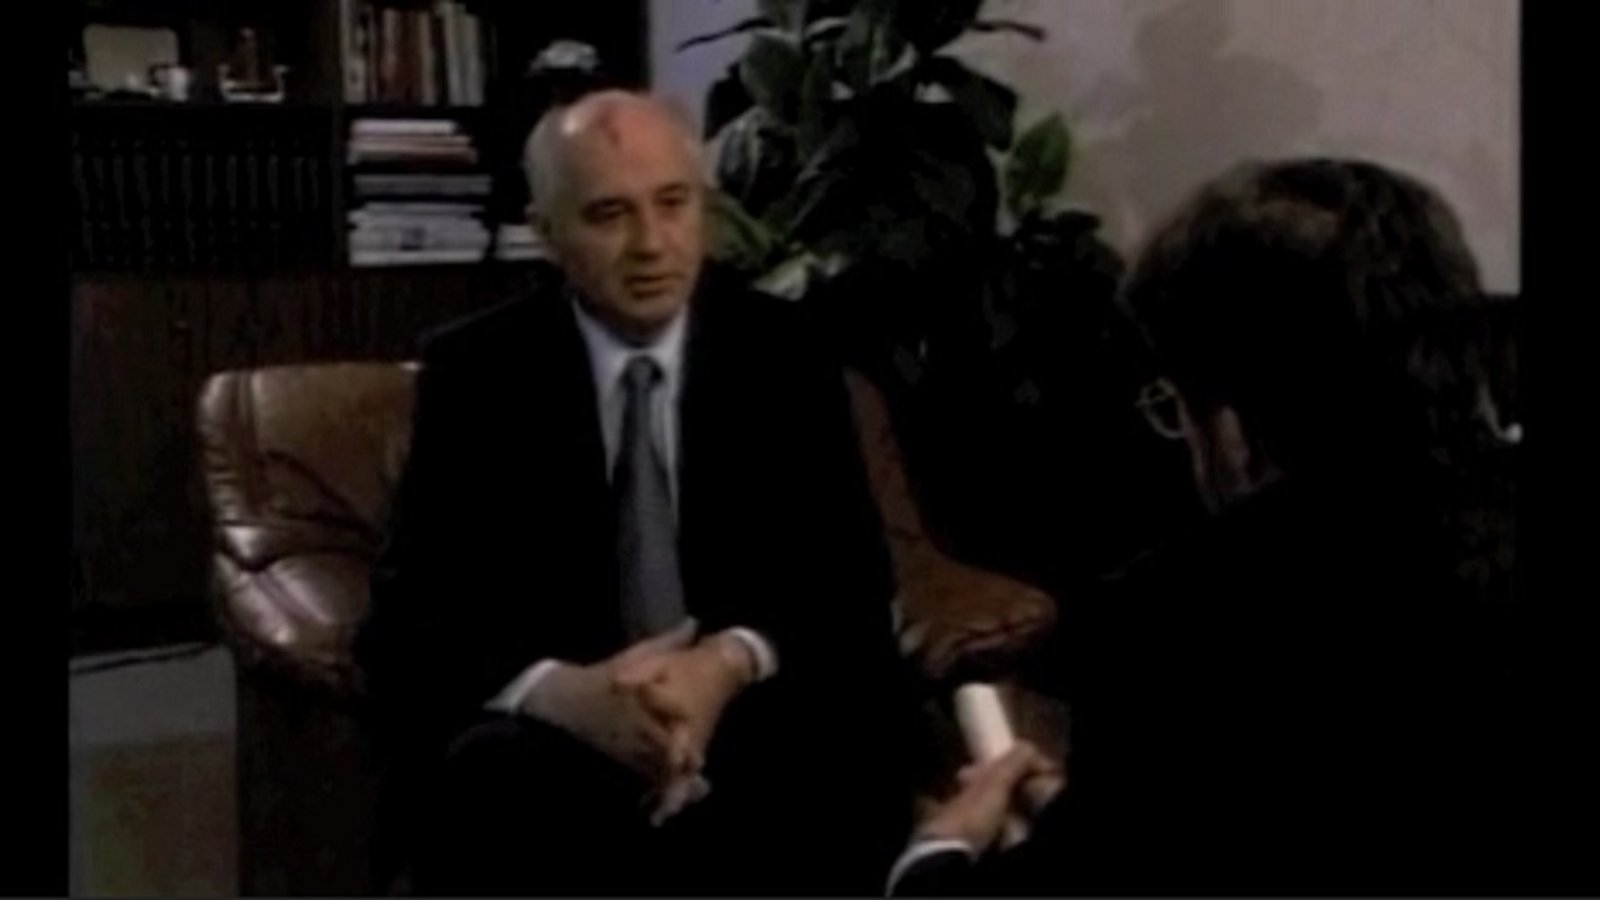 Conversations with Gorbachev